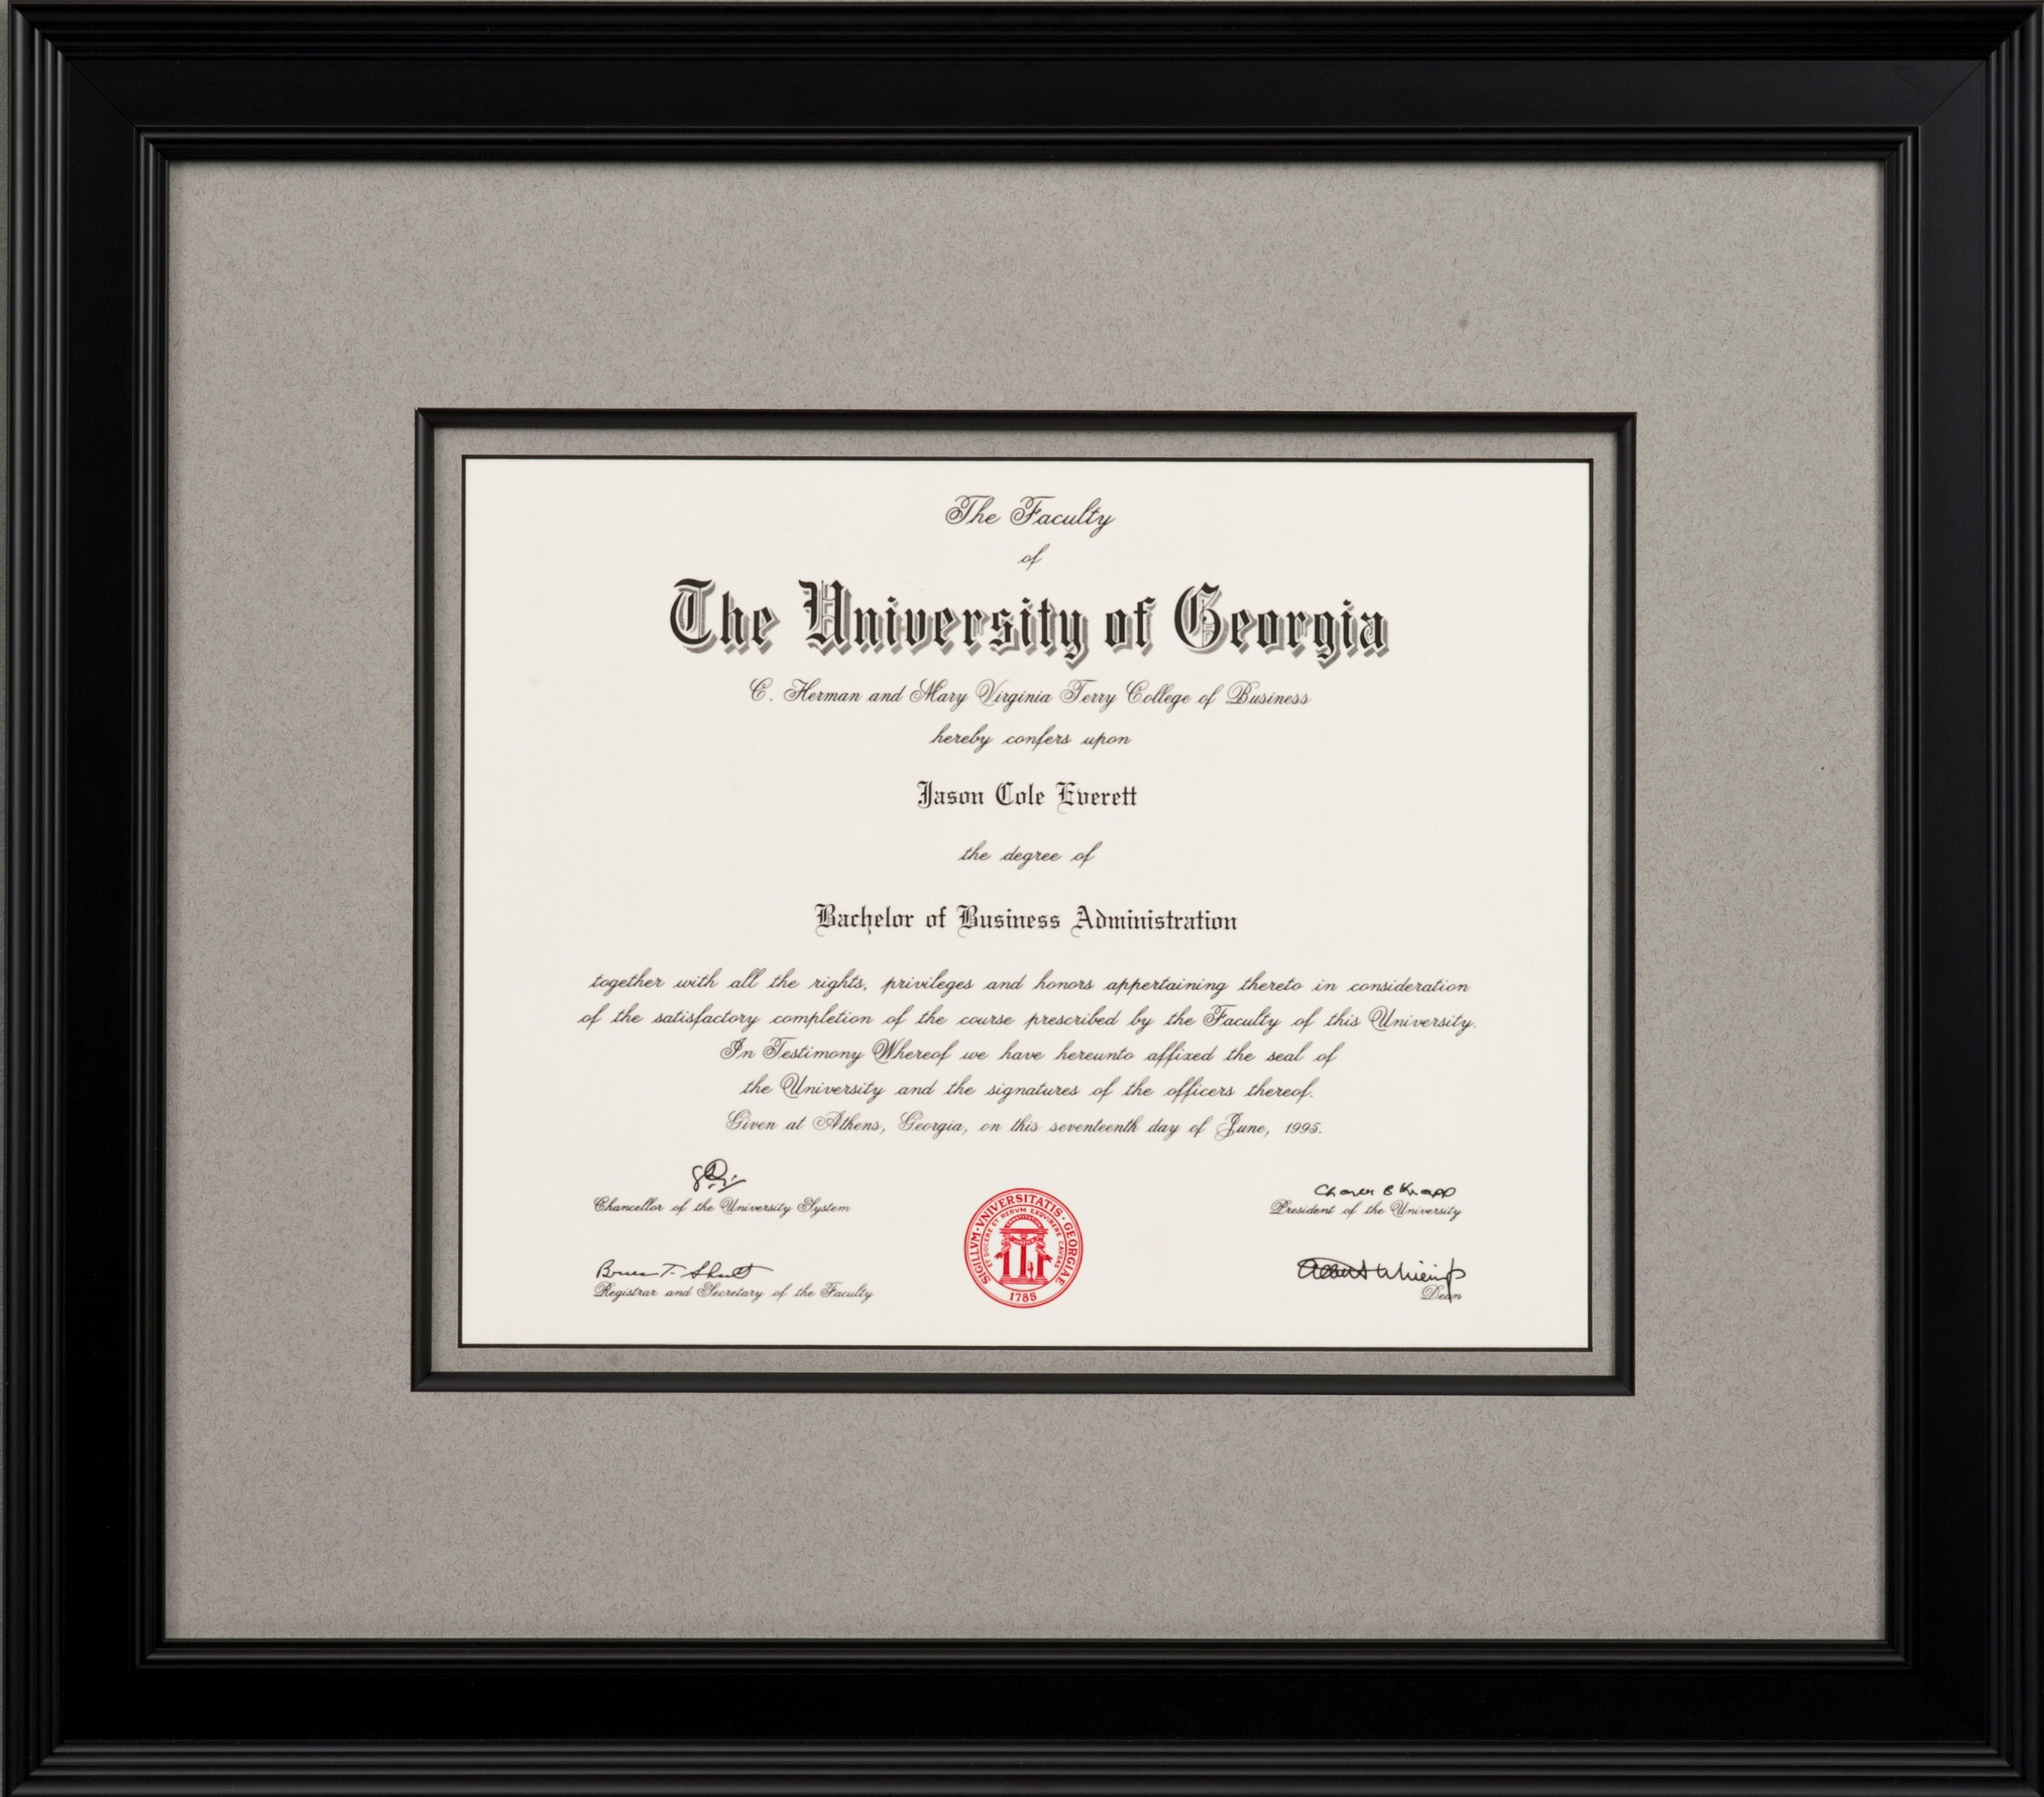 Diploma Framing - The Great Frame Up